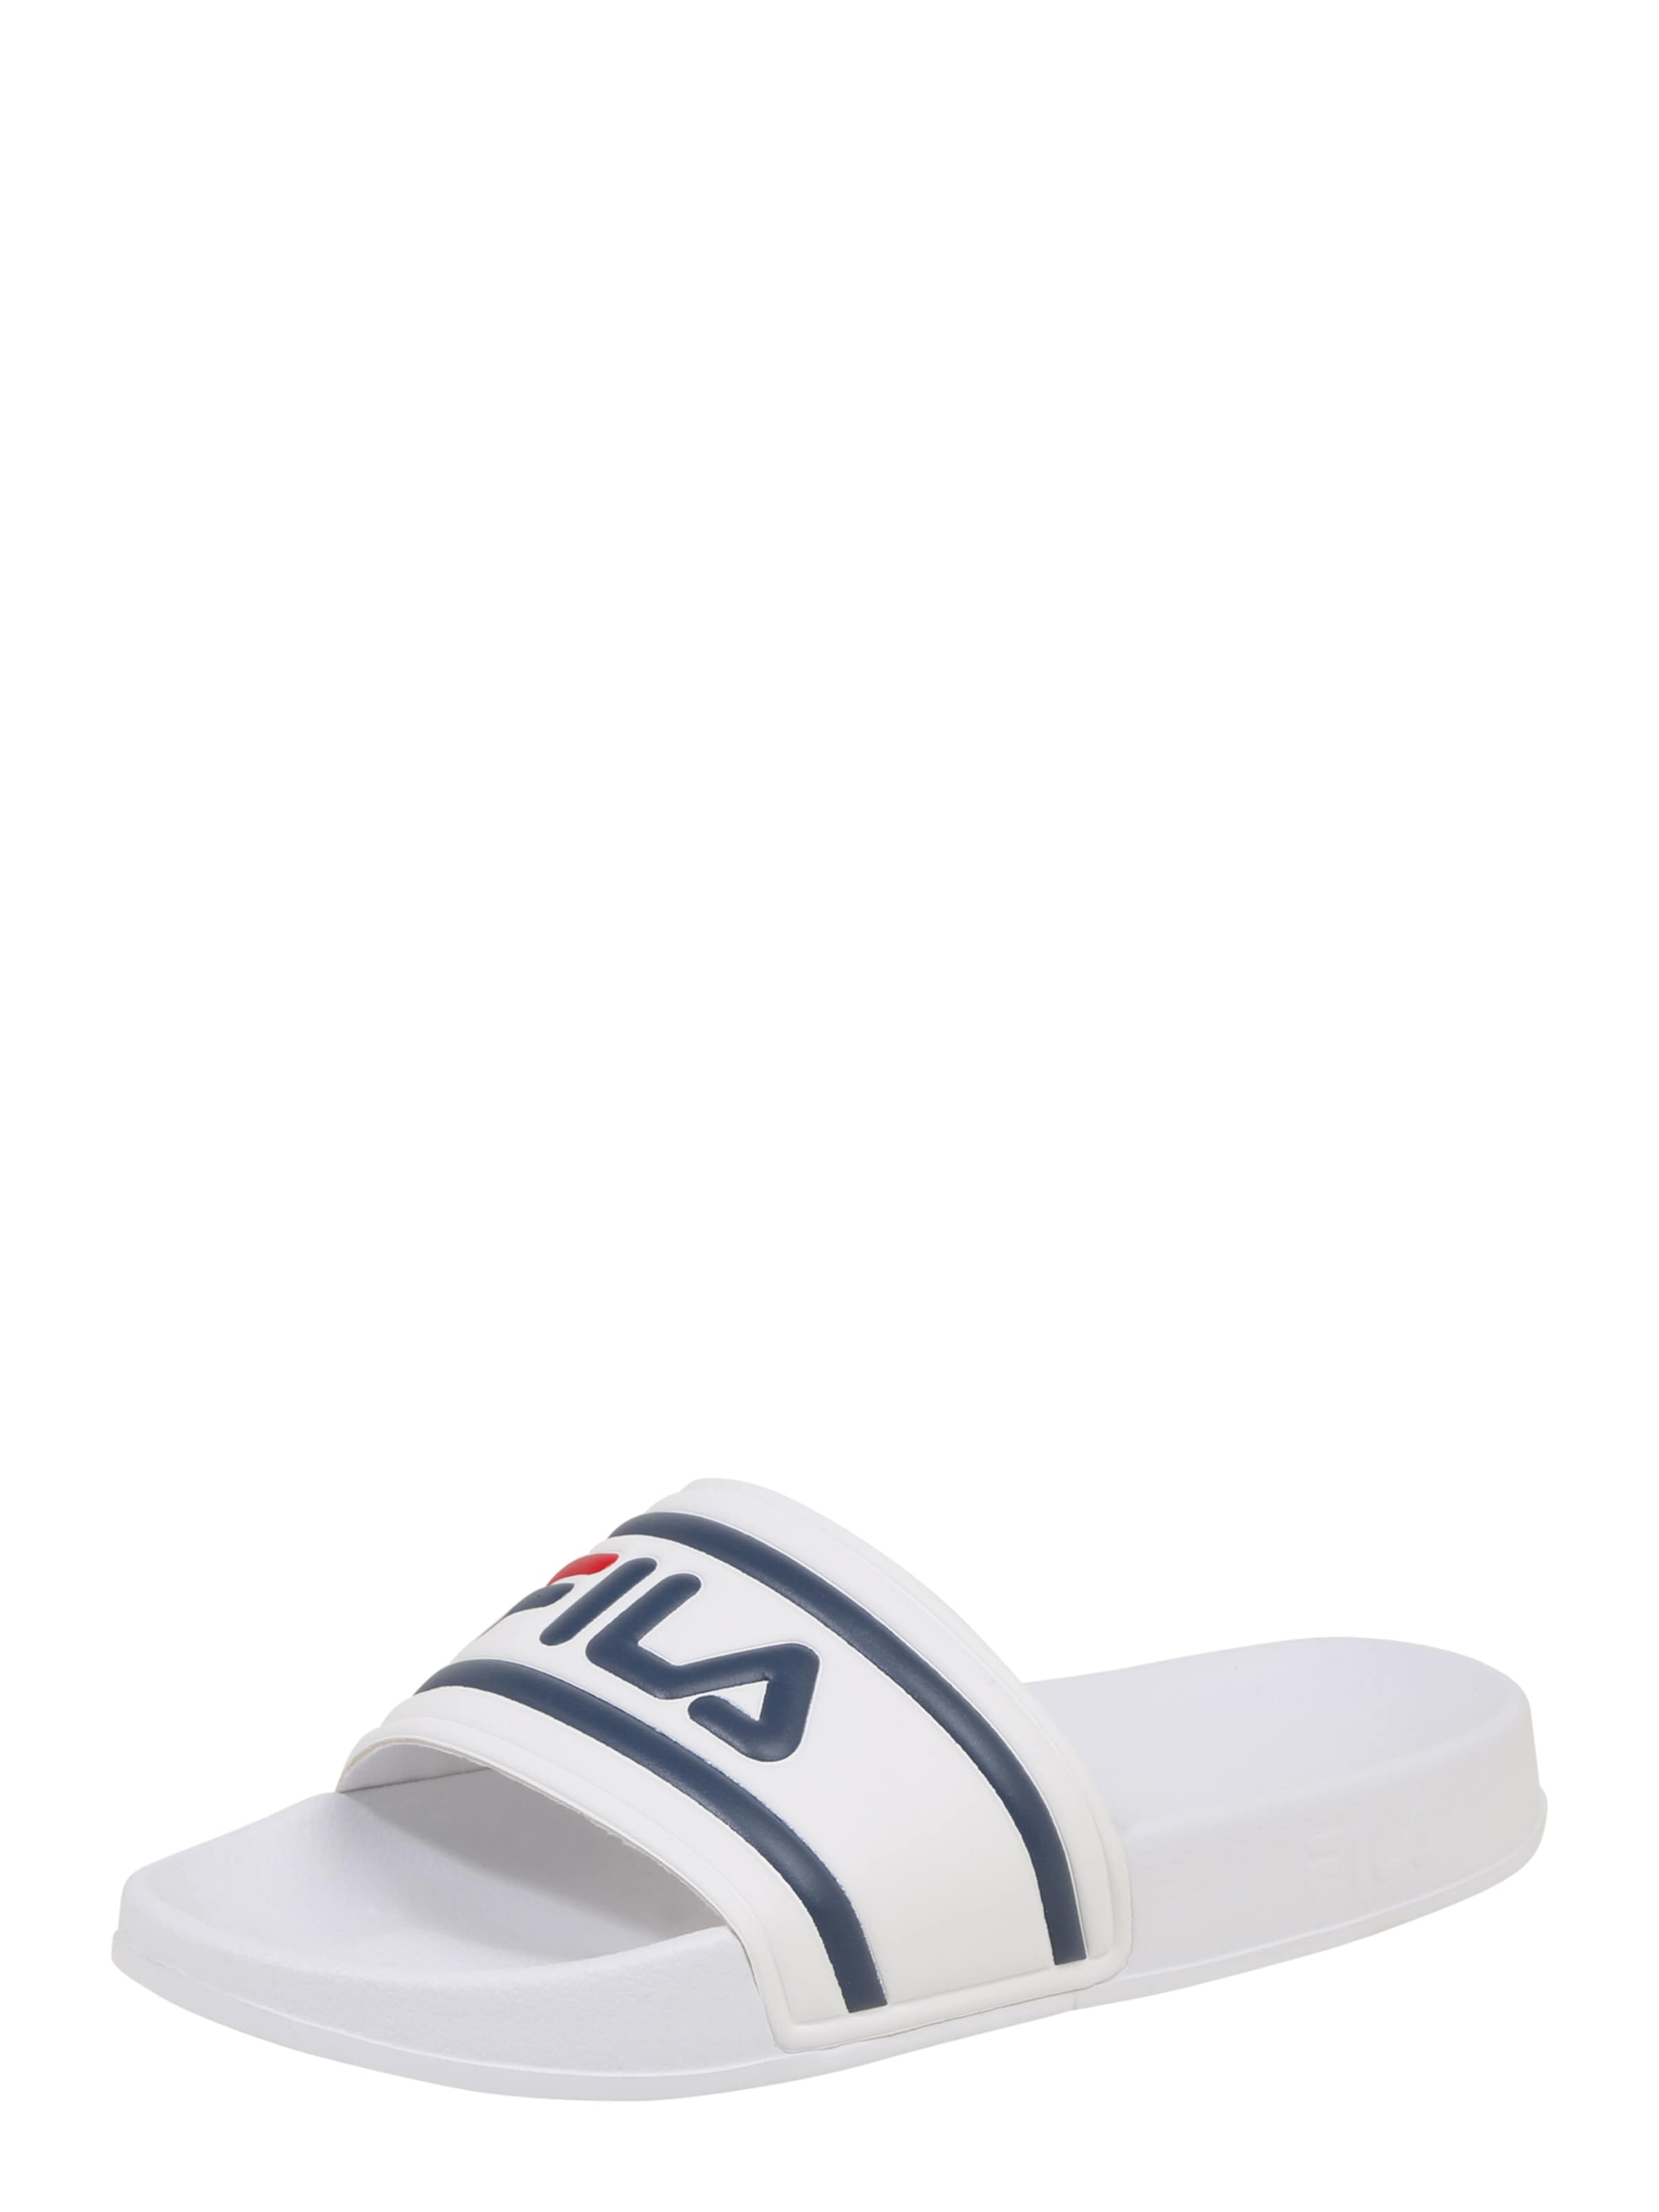 FILA Slides-Pantolette Morro Bay Verschleißfeste billige Schuhe